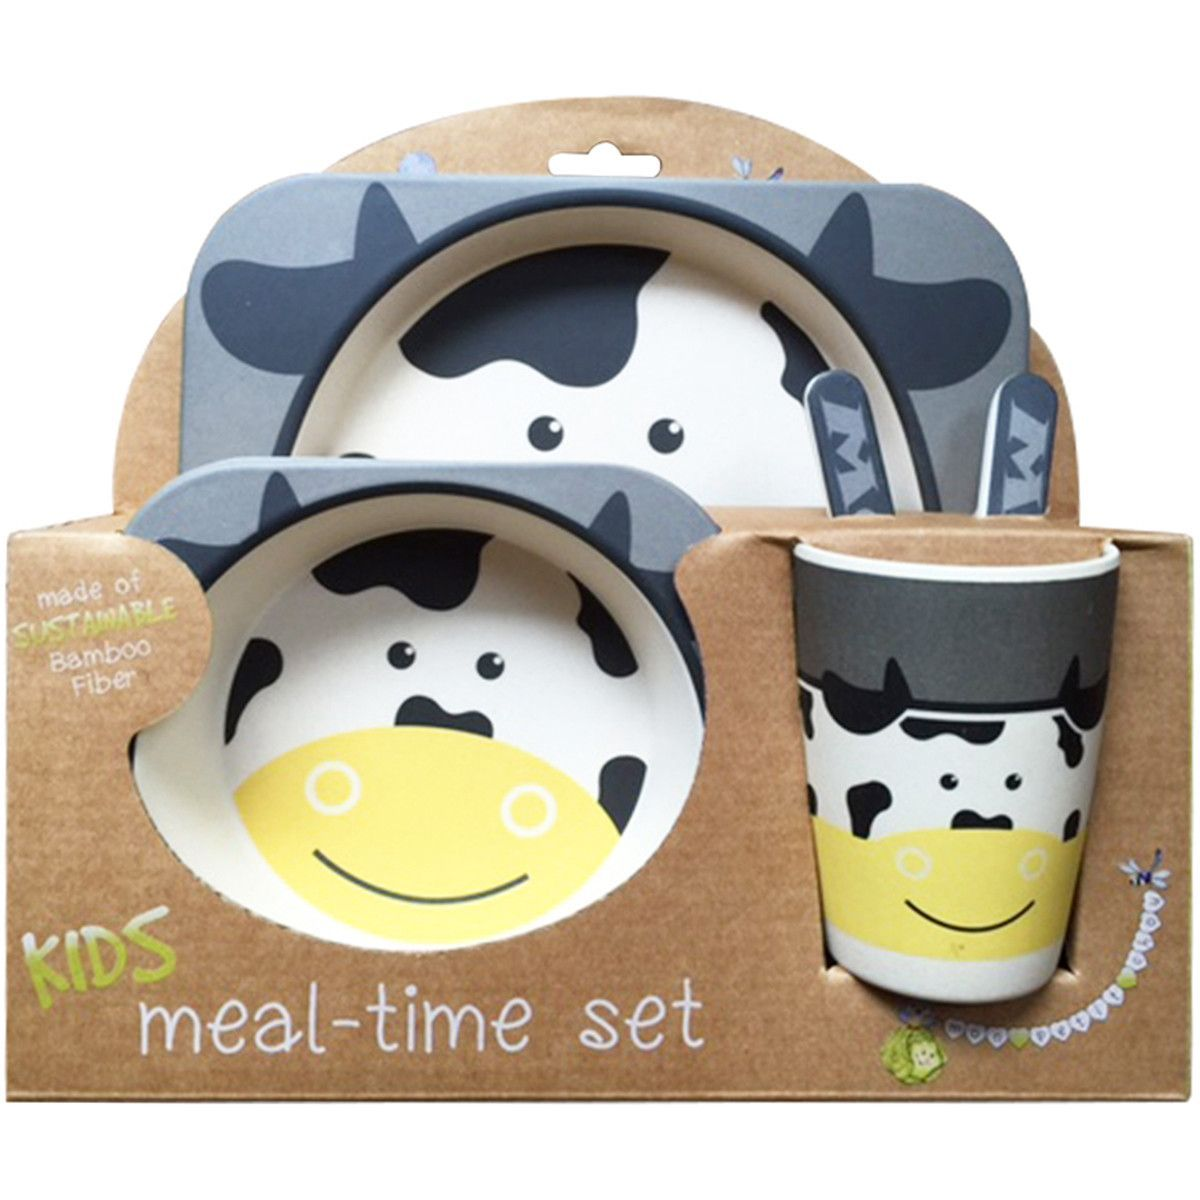 Bamboo Fiber Kids 5 Piece Dinnerware Set Kids Plates Kids Plates Set Plate Sets